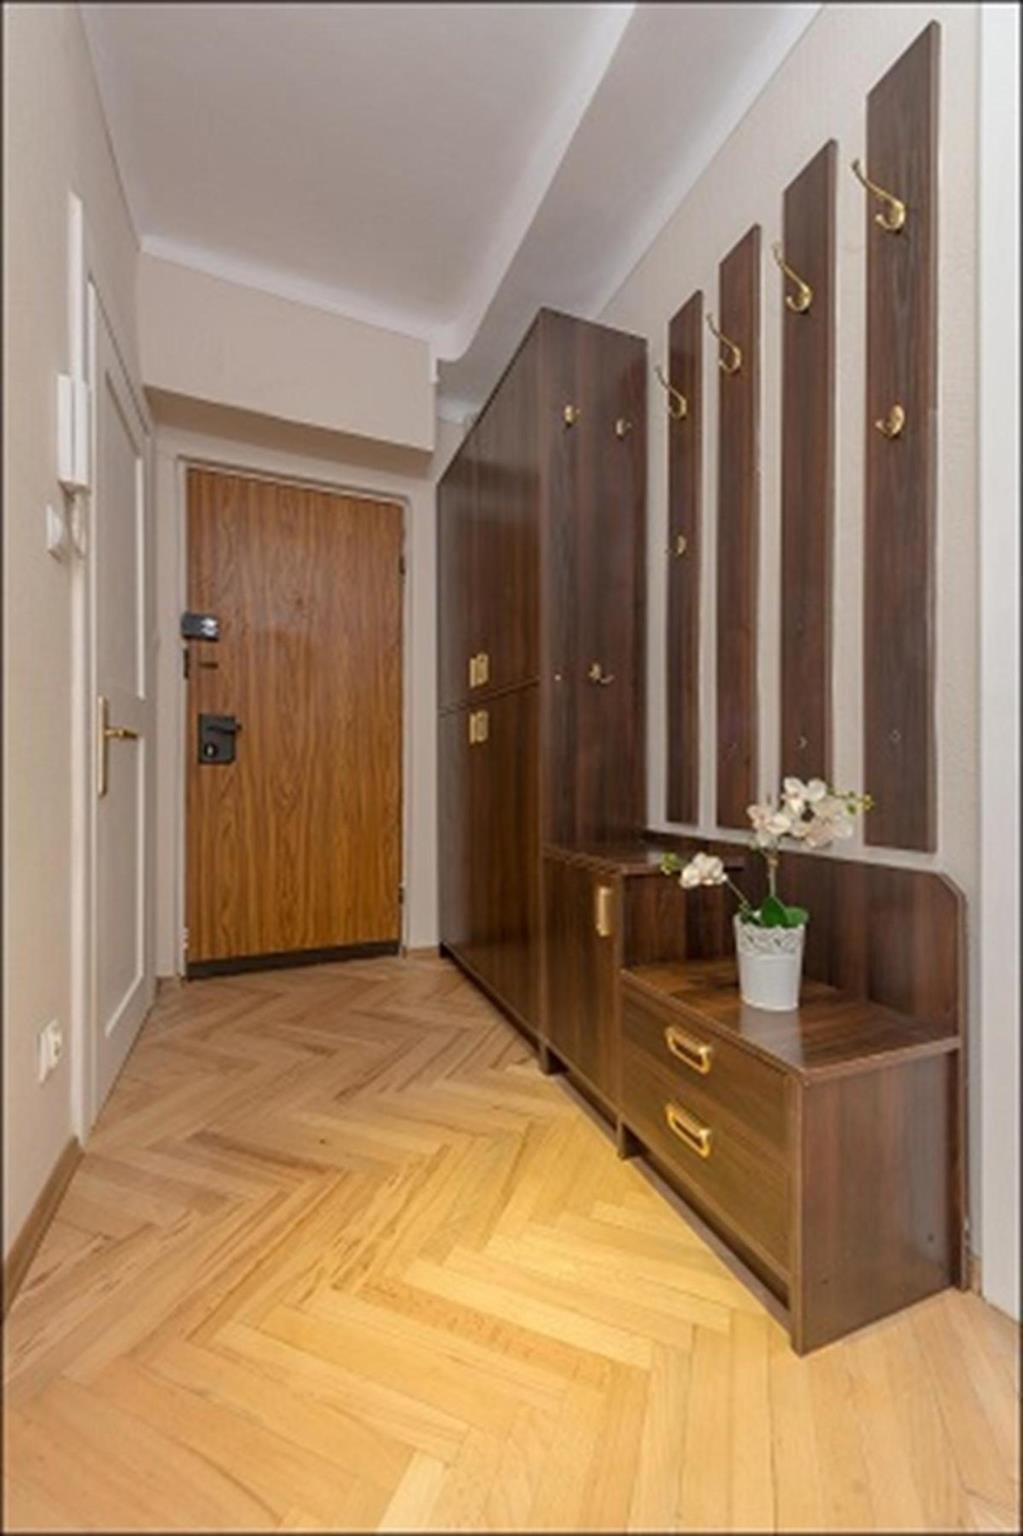 P&O Apartments Miodowa 2